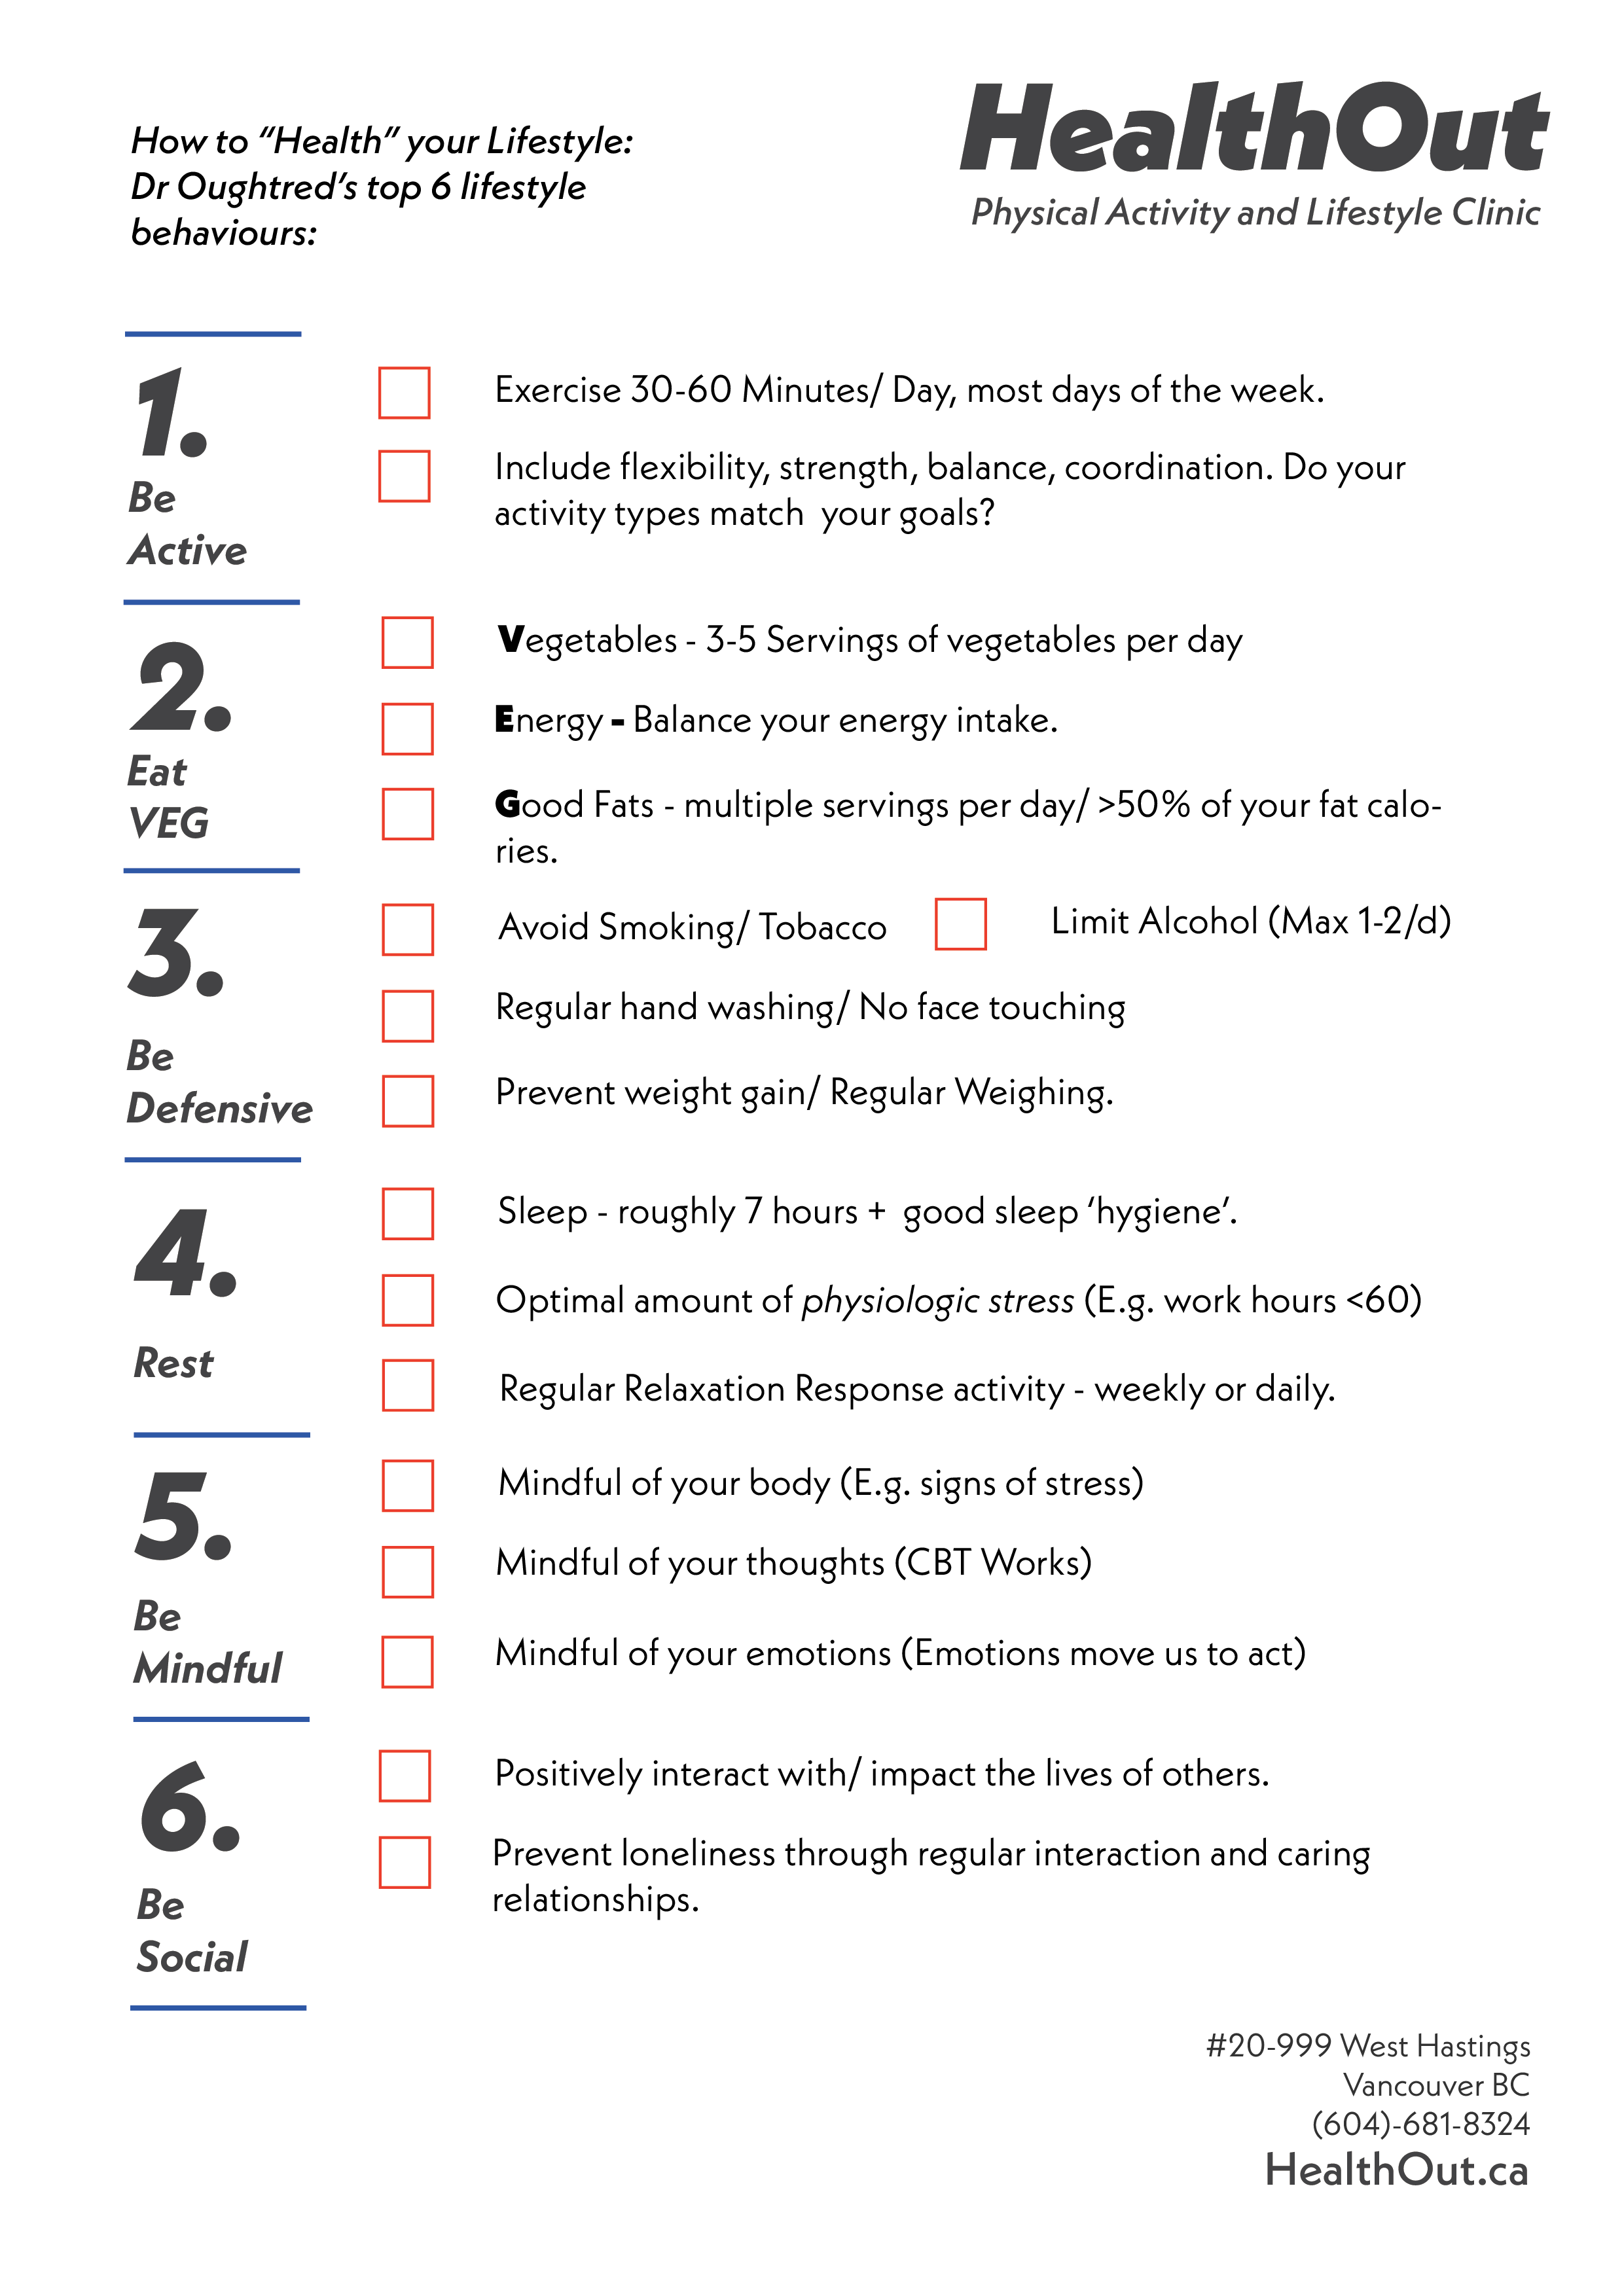 HealthOut Lifesyle Checklist-01.png